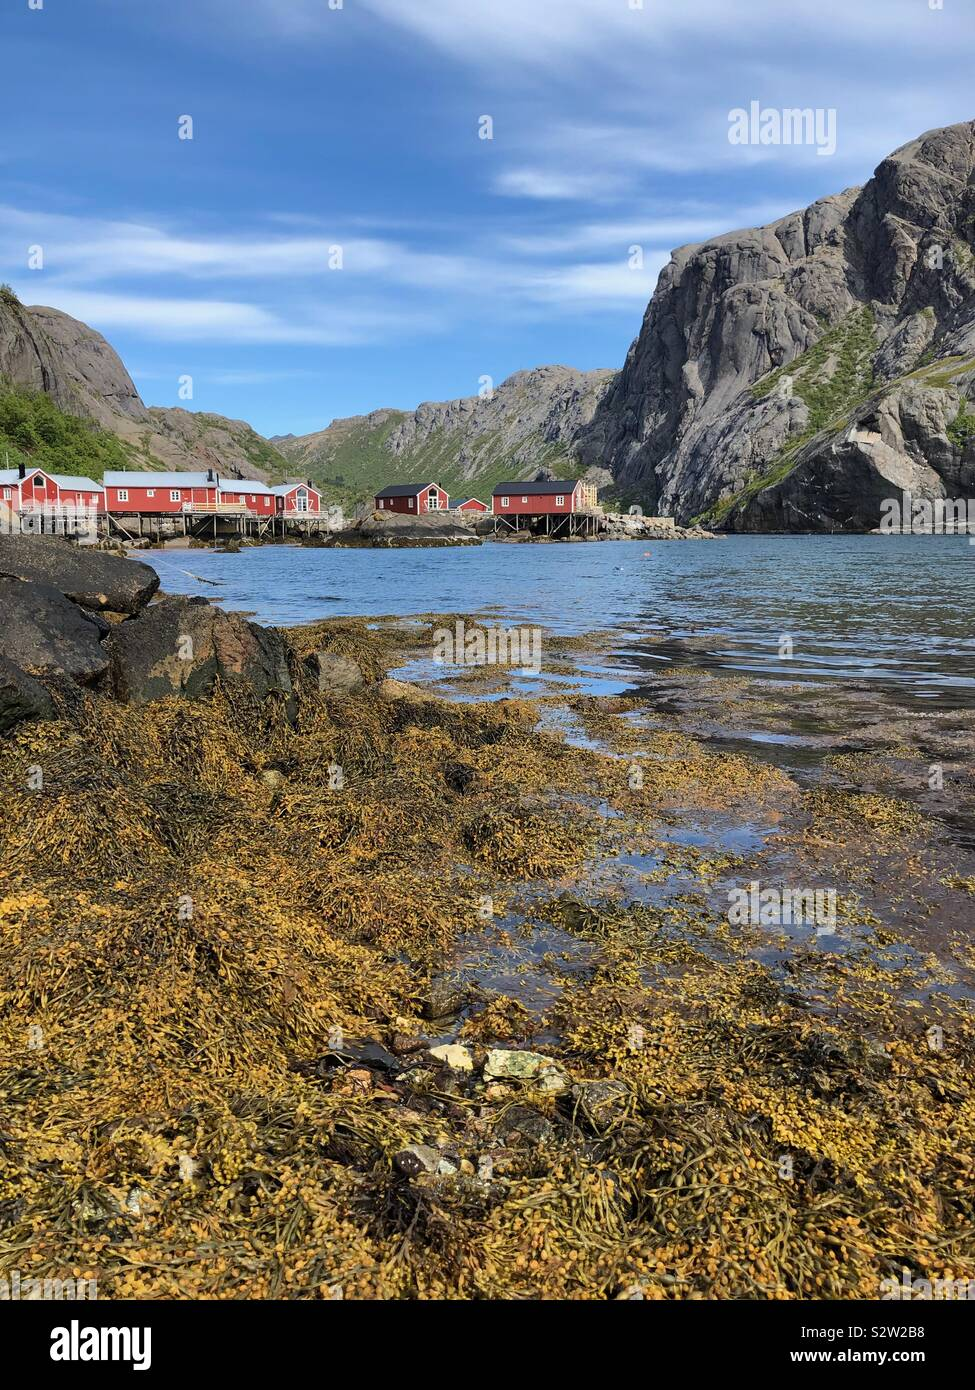 Nusfjord, Isole Lofoten in Norvegia Foto Stock